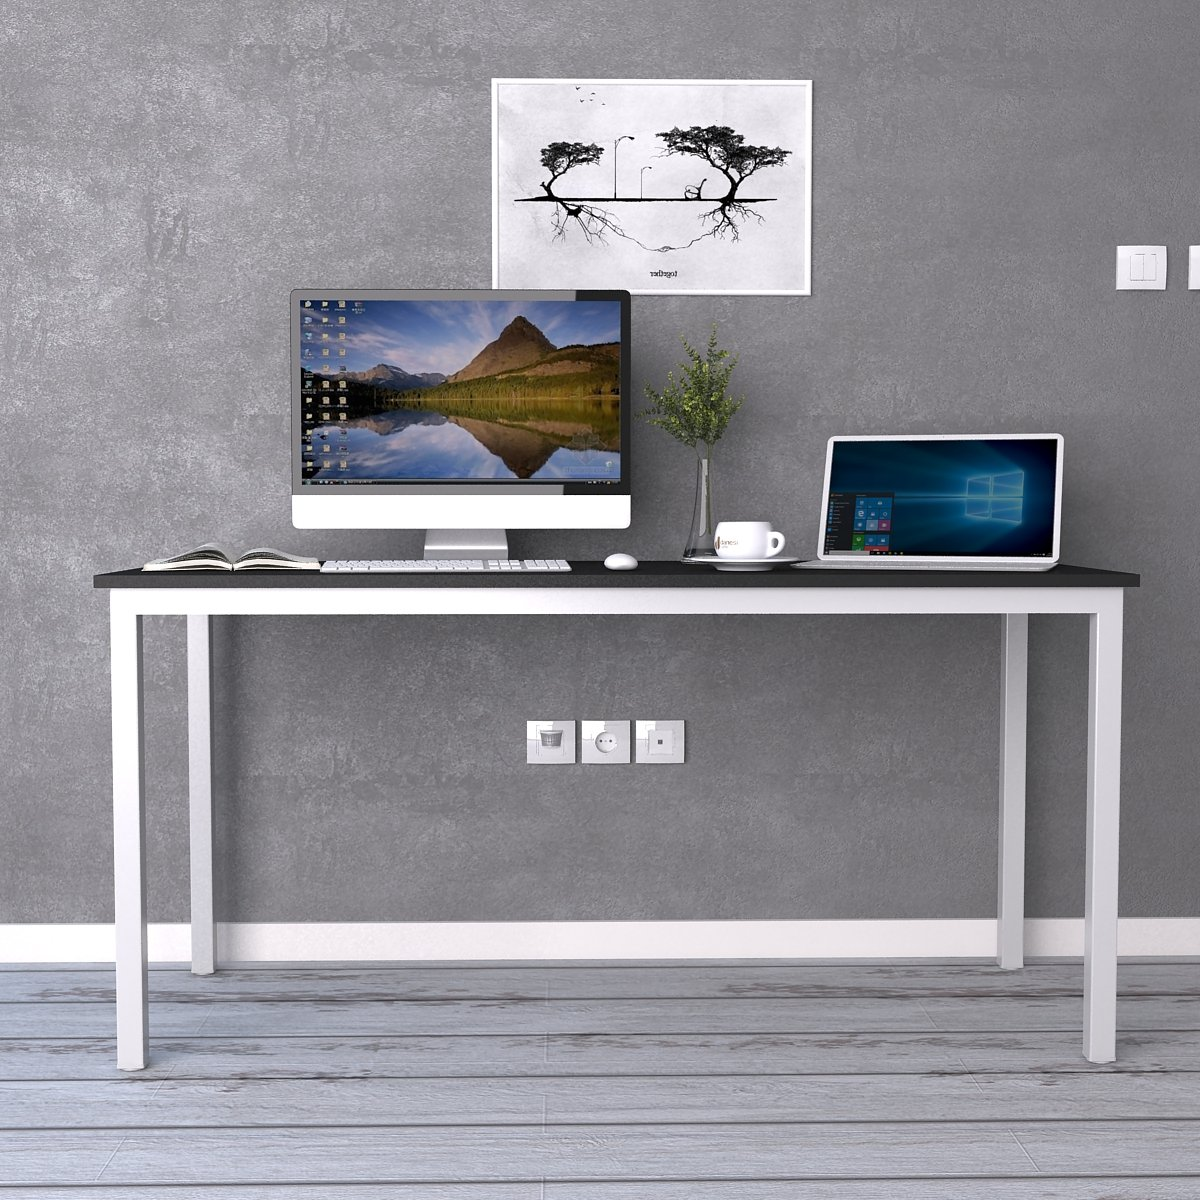 Need Computer Desk 63'' Large Desk Writing Desk with BIFMA Certification Workstation Office Desk, AC3CW-160